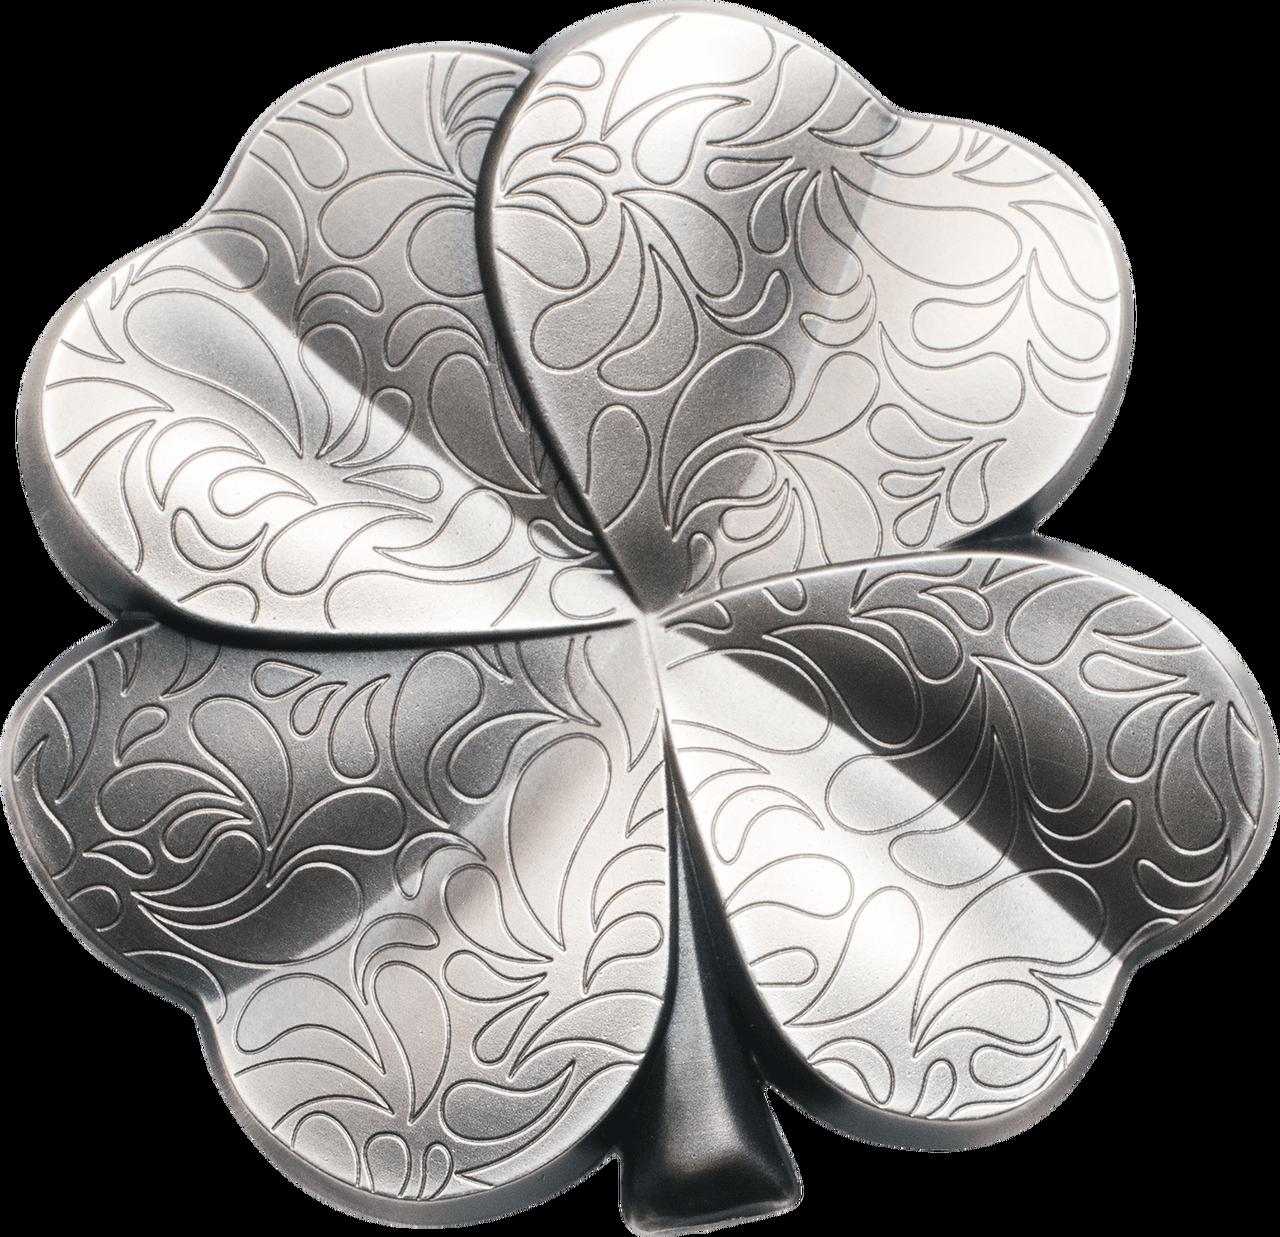 Silver Fortune Four Leaf Clover Shape 1 Oz Silver Coin 5 Palau 2018